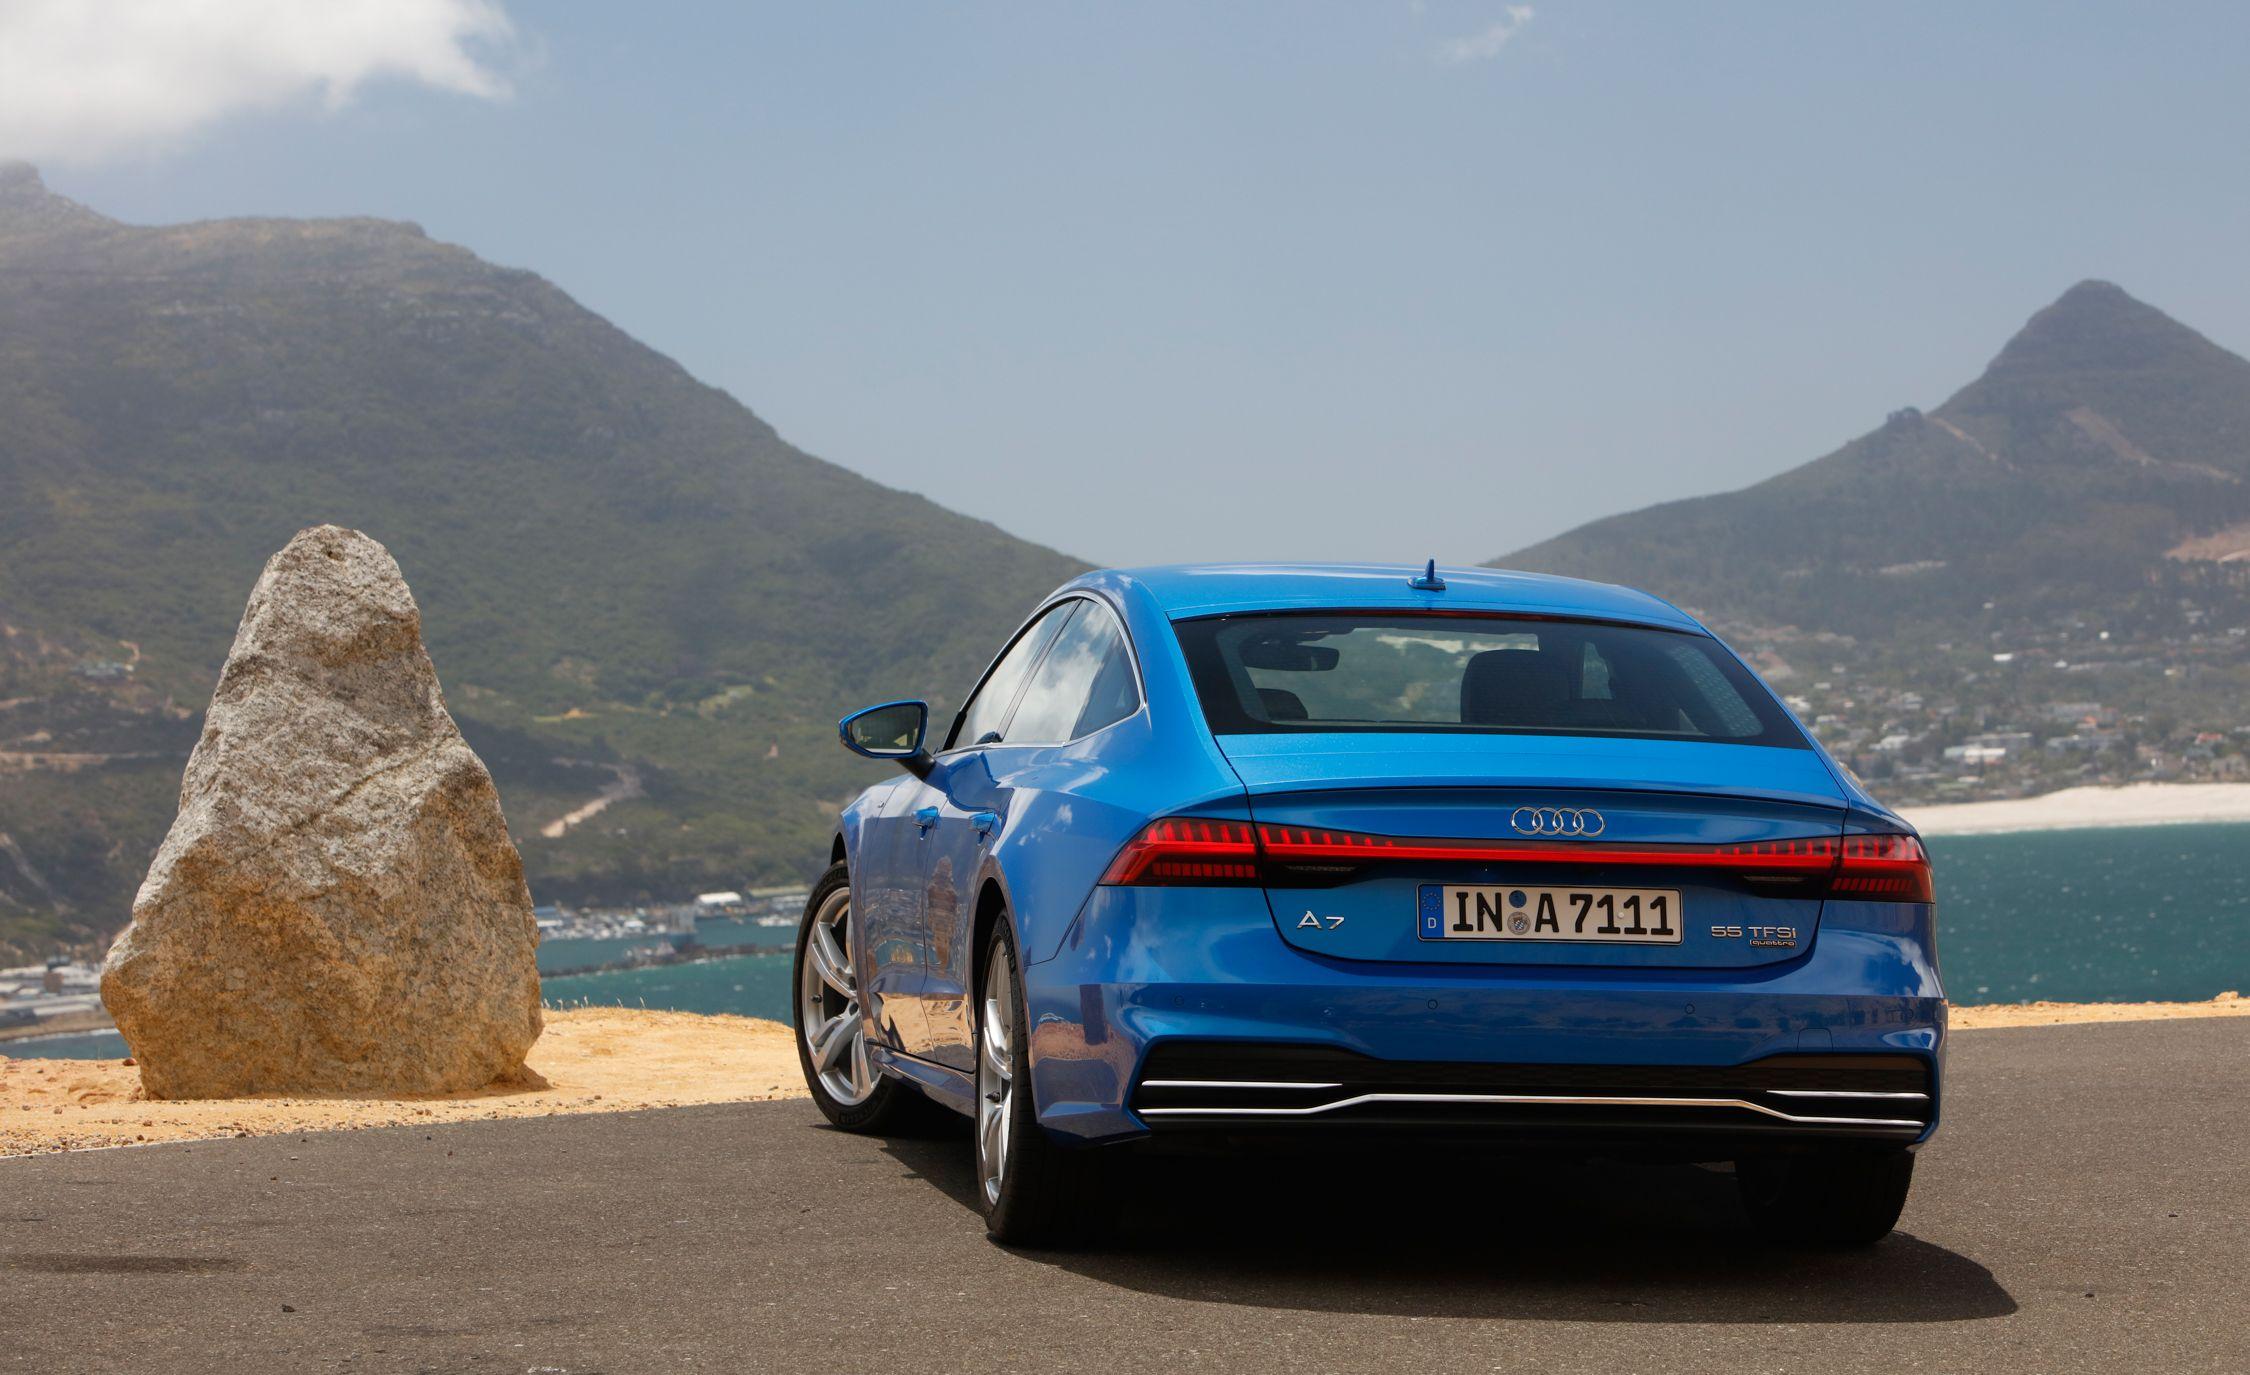 2019-Audi-A7-Sportback-123-1.jpg